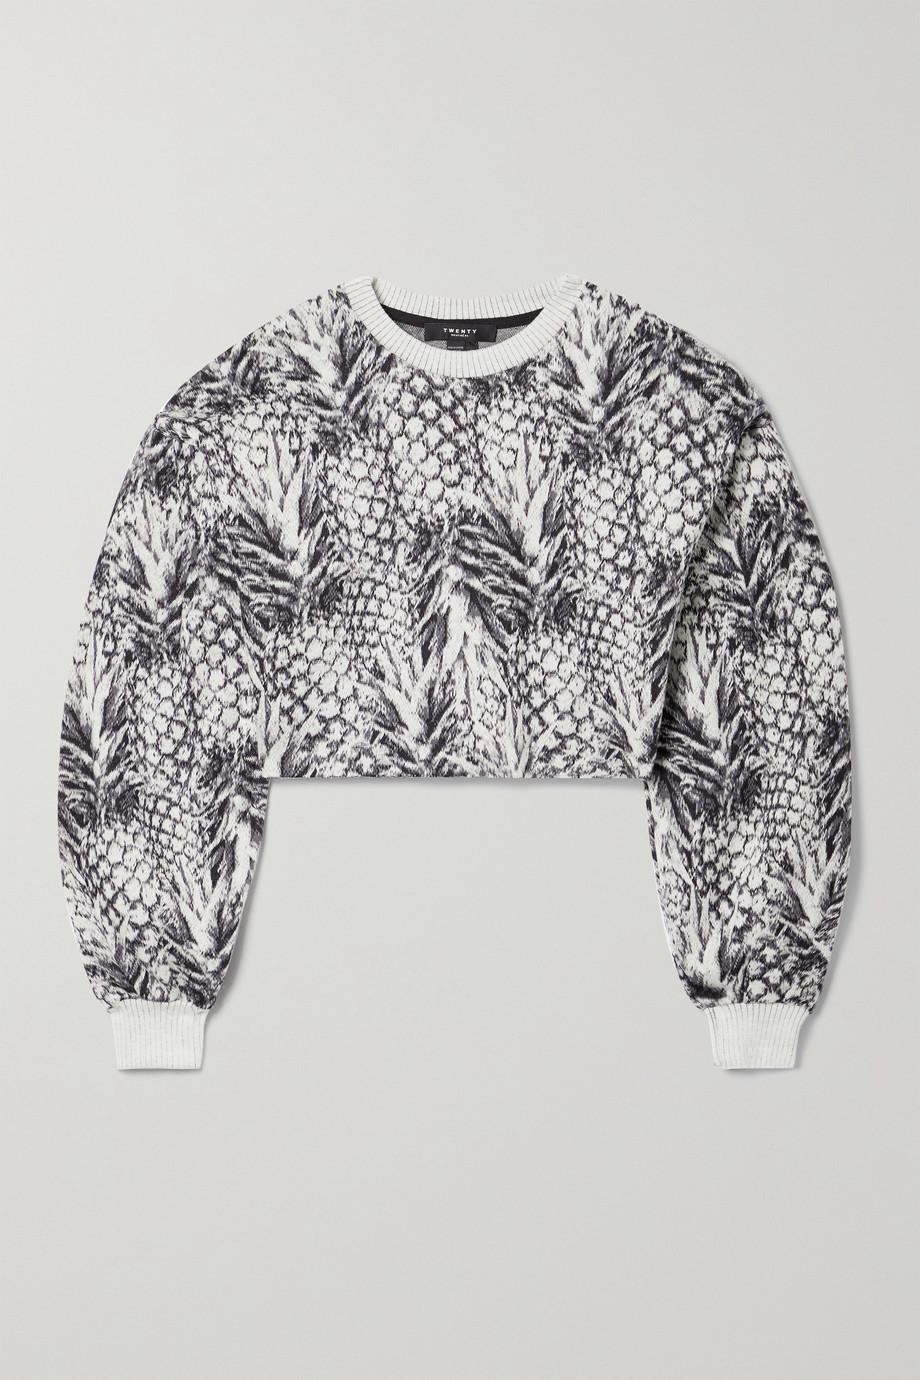 TWENTY Montréal Pineapple Hyper Reality cropped jacquard-knit cotton-blend sweater